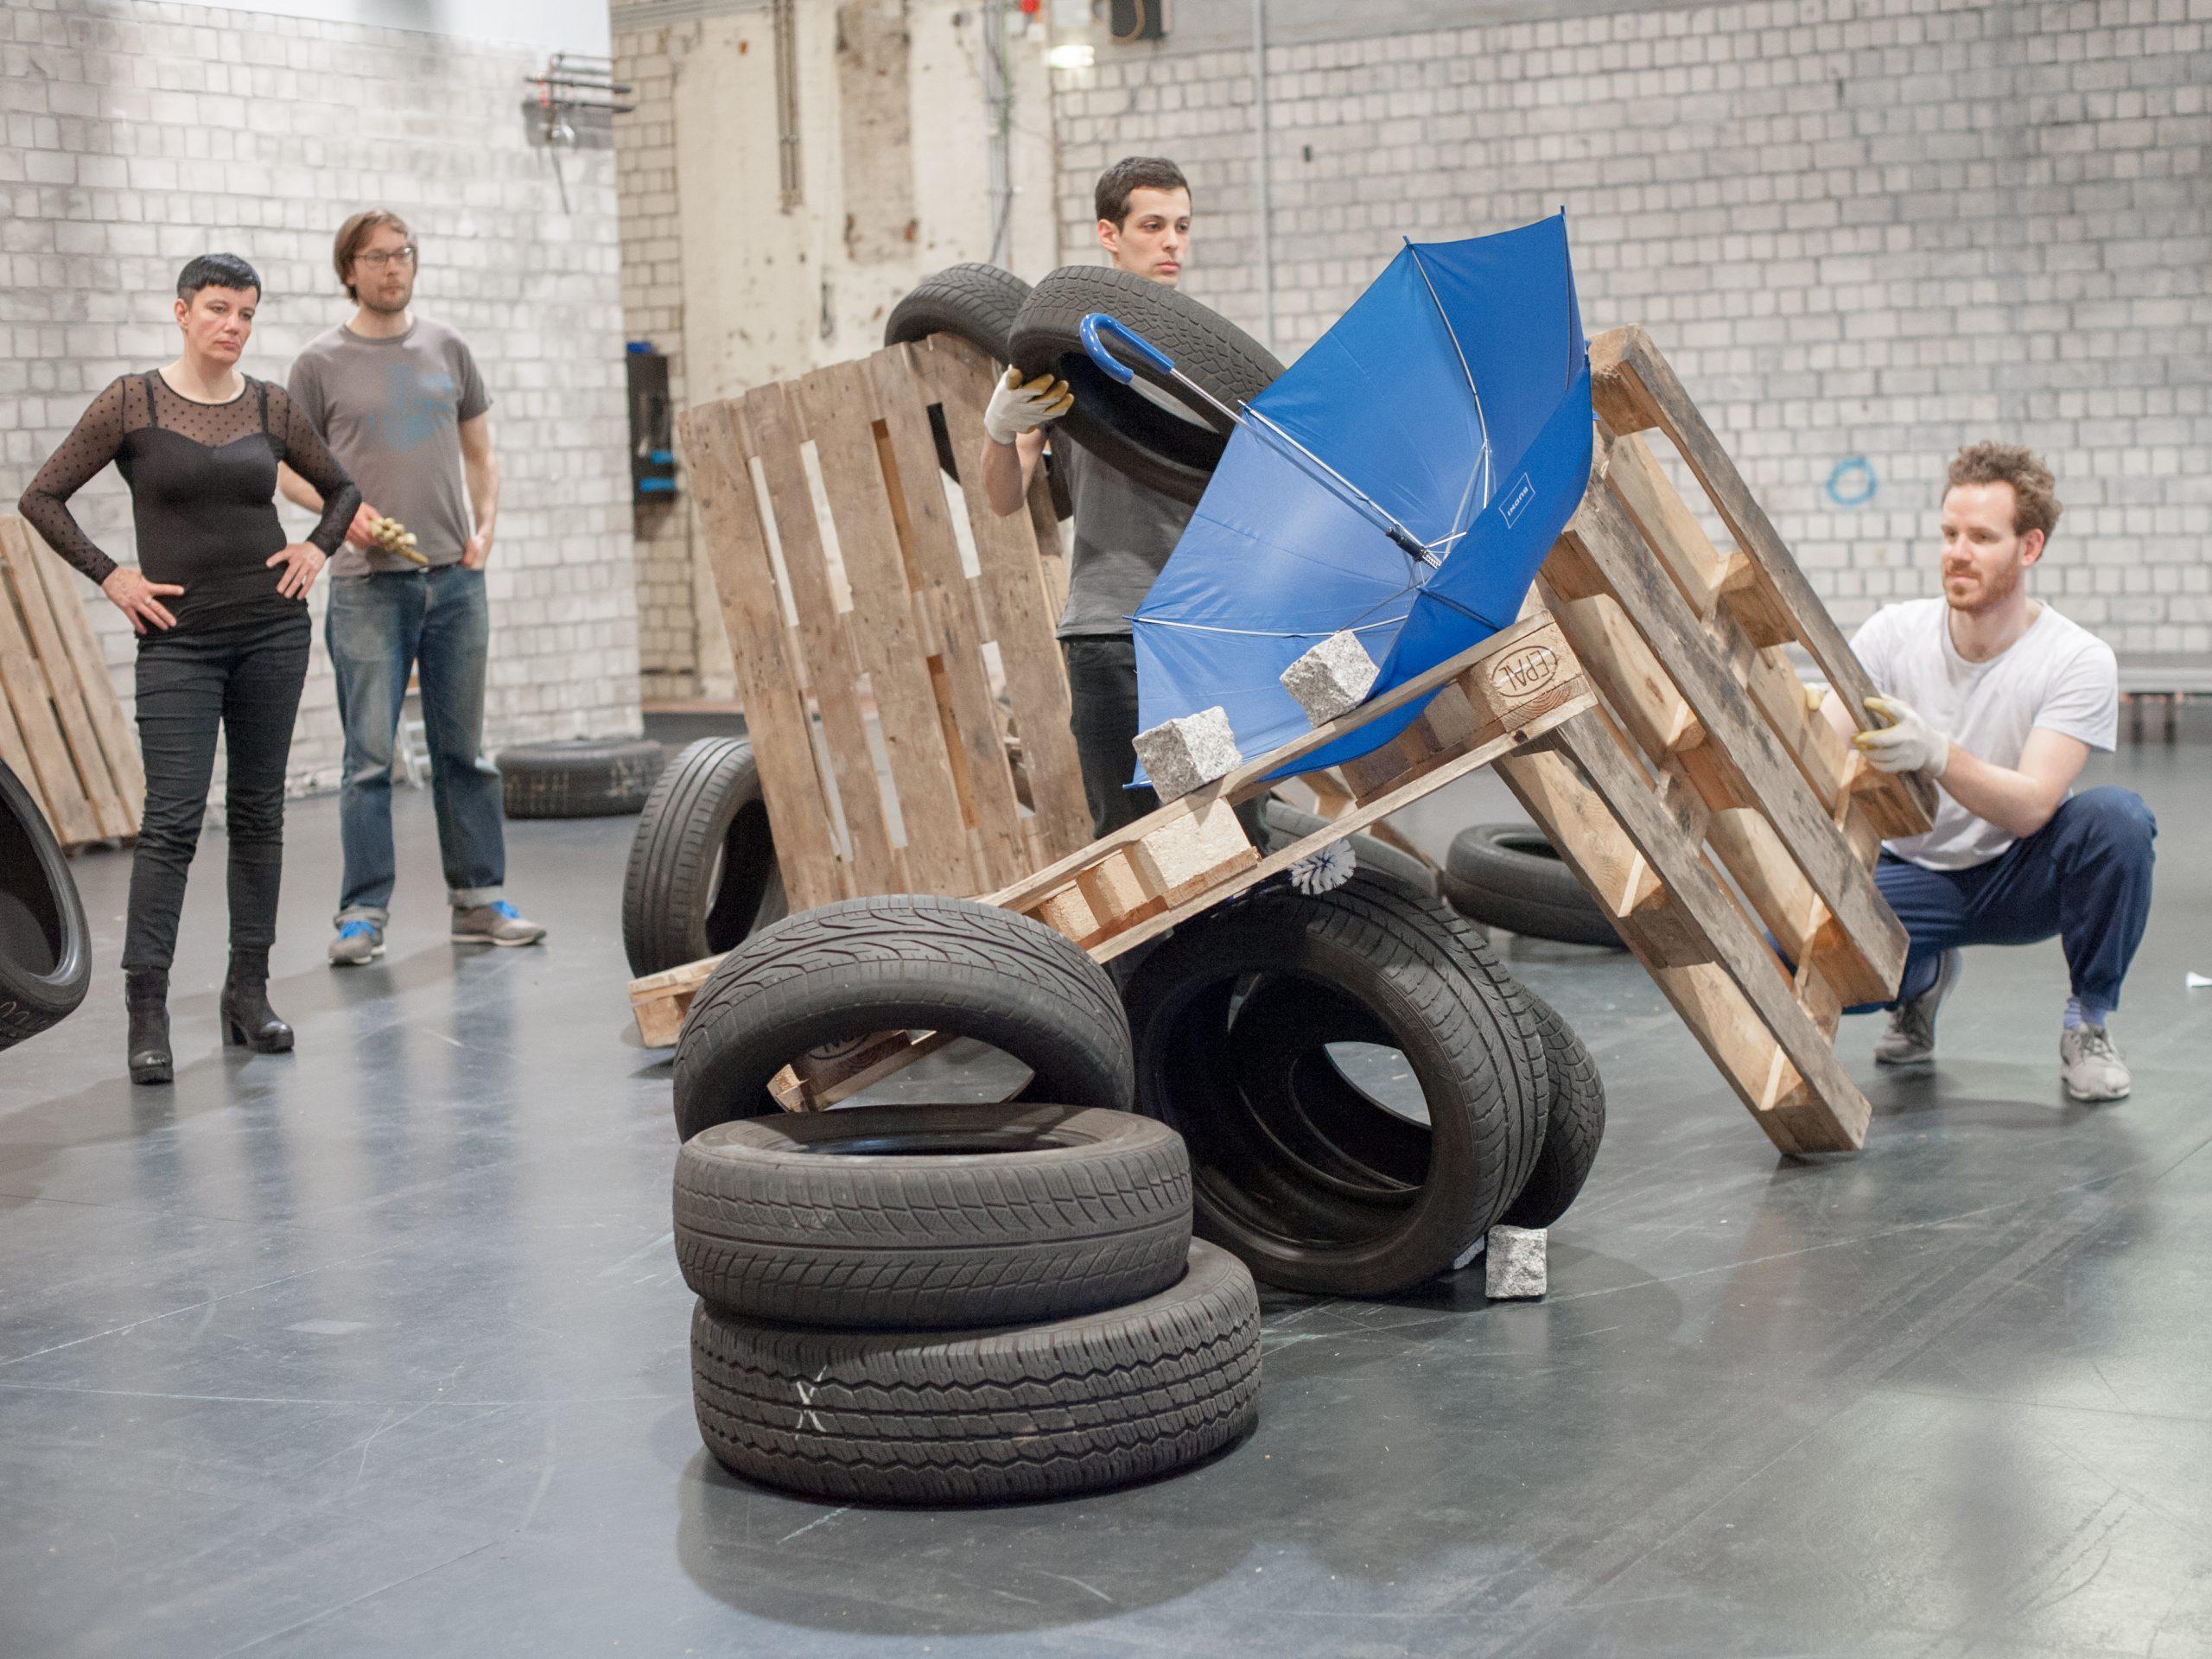 Moritz Frischkorn, A Careful Process of Composition: On Barricades and Dances, 2016, Hamburg